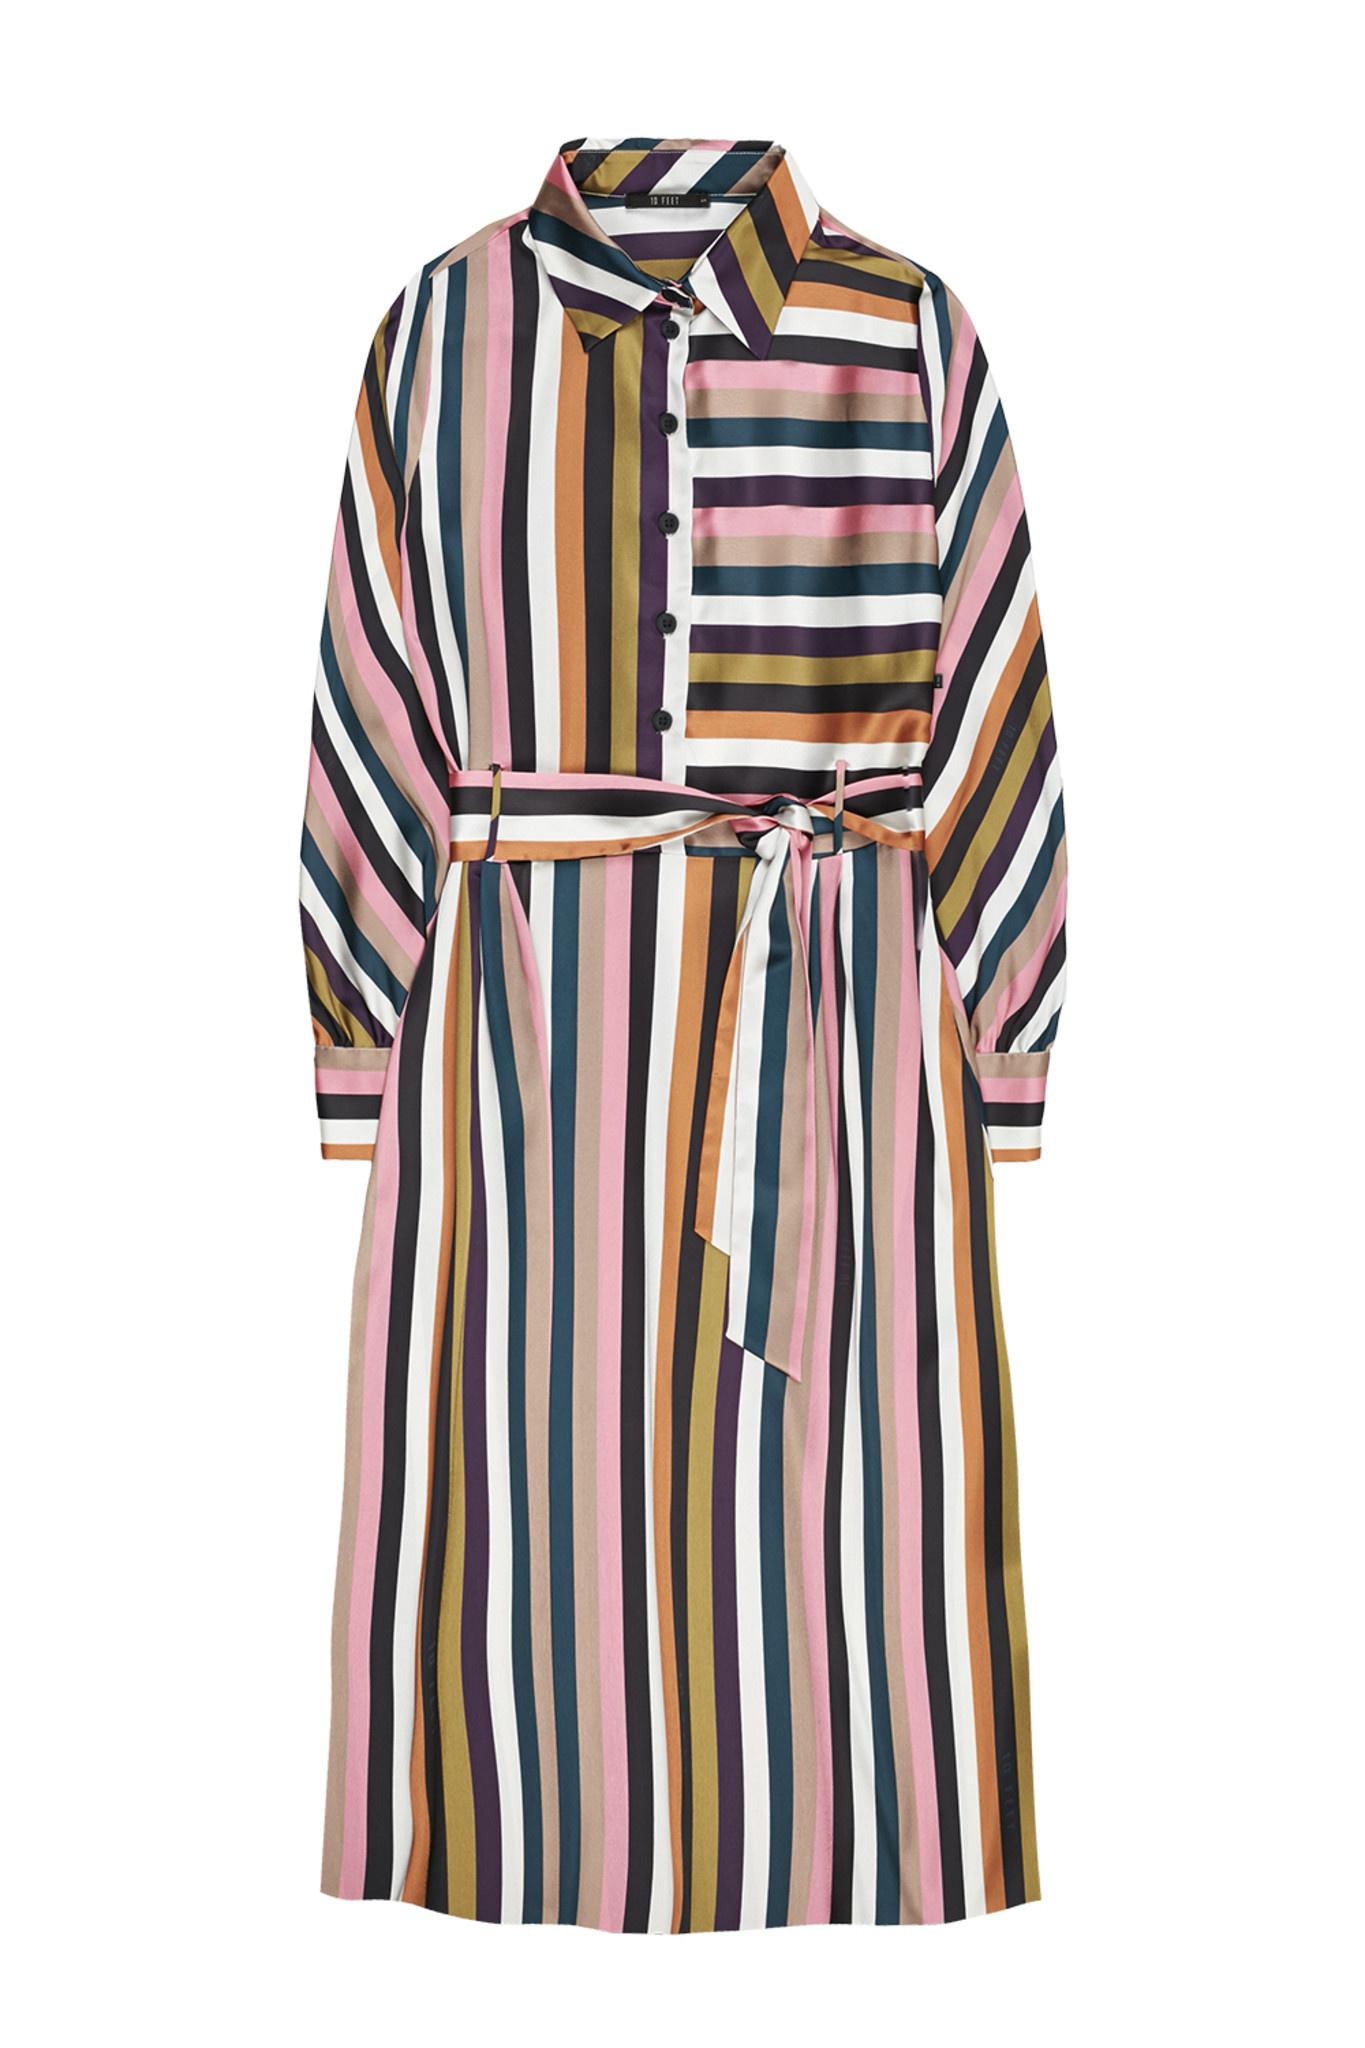 Jurk Over the knee multi colour striped-1